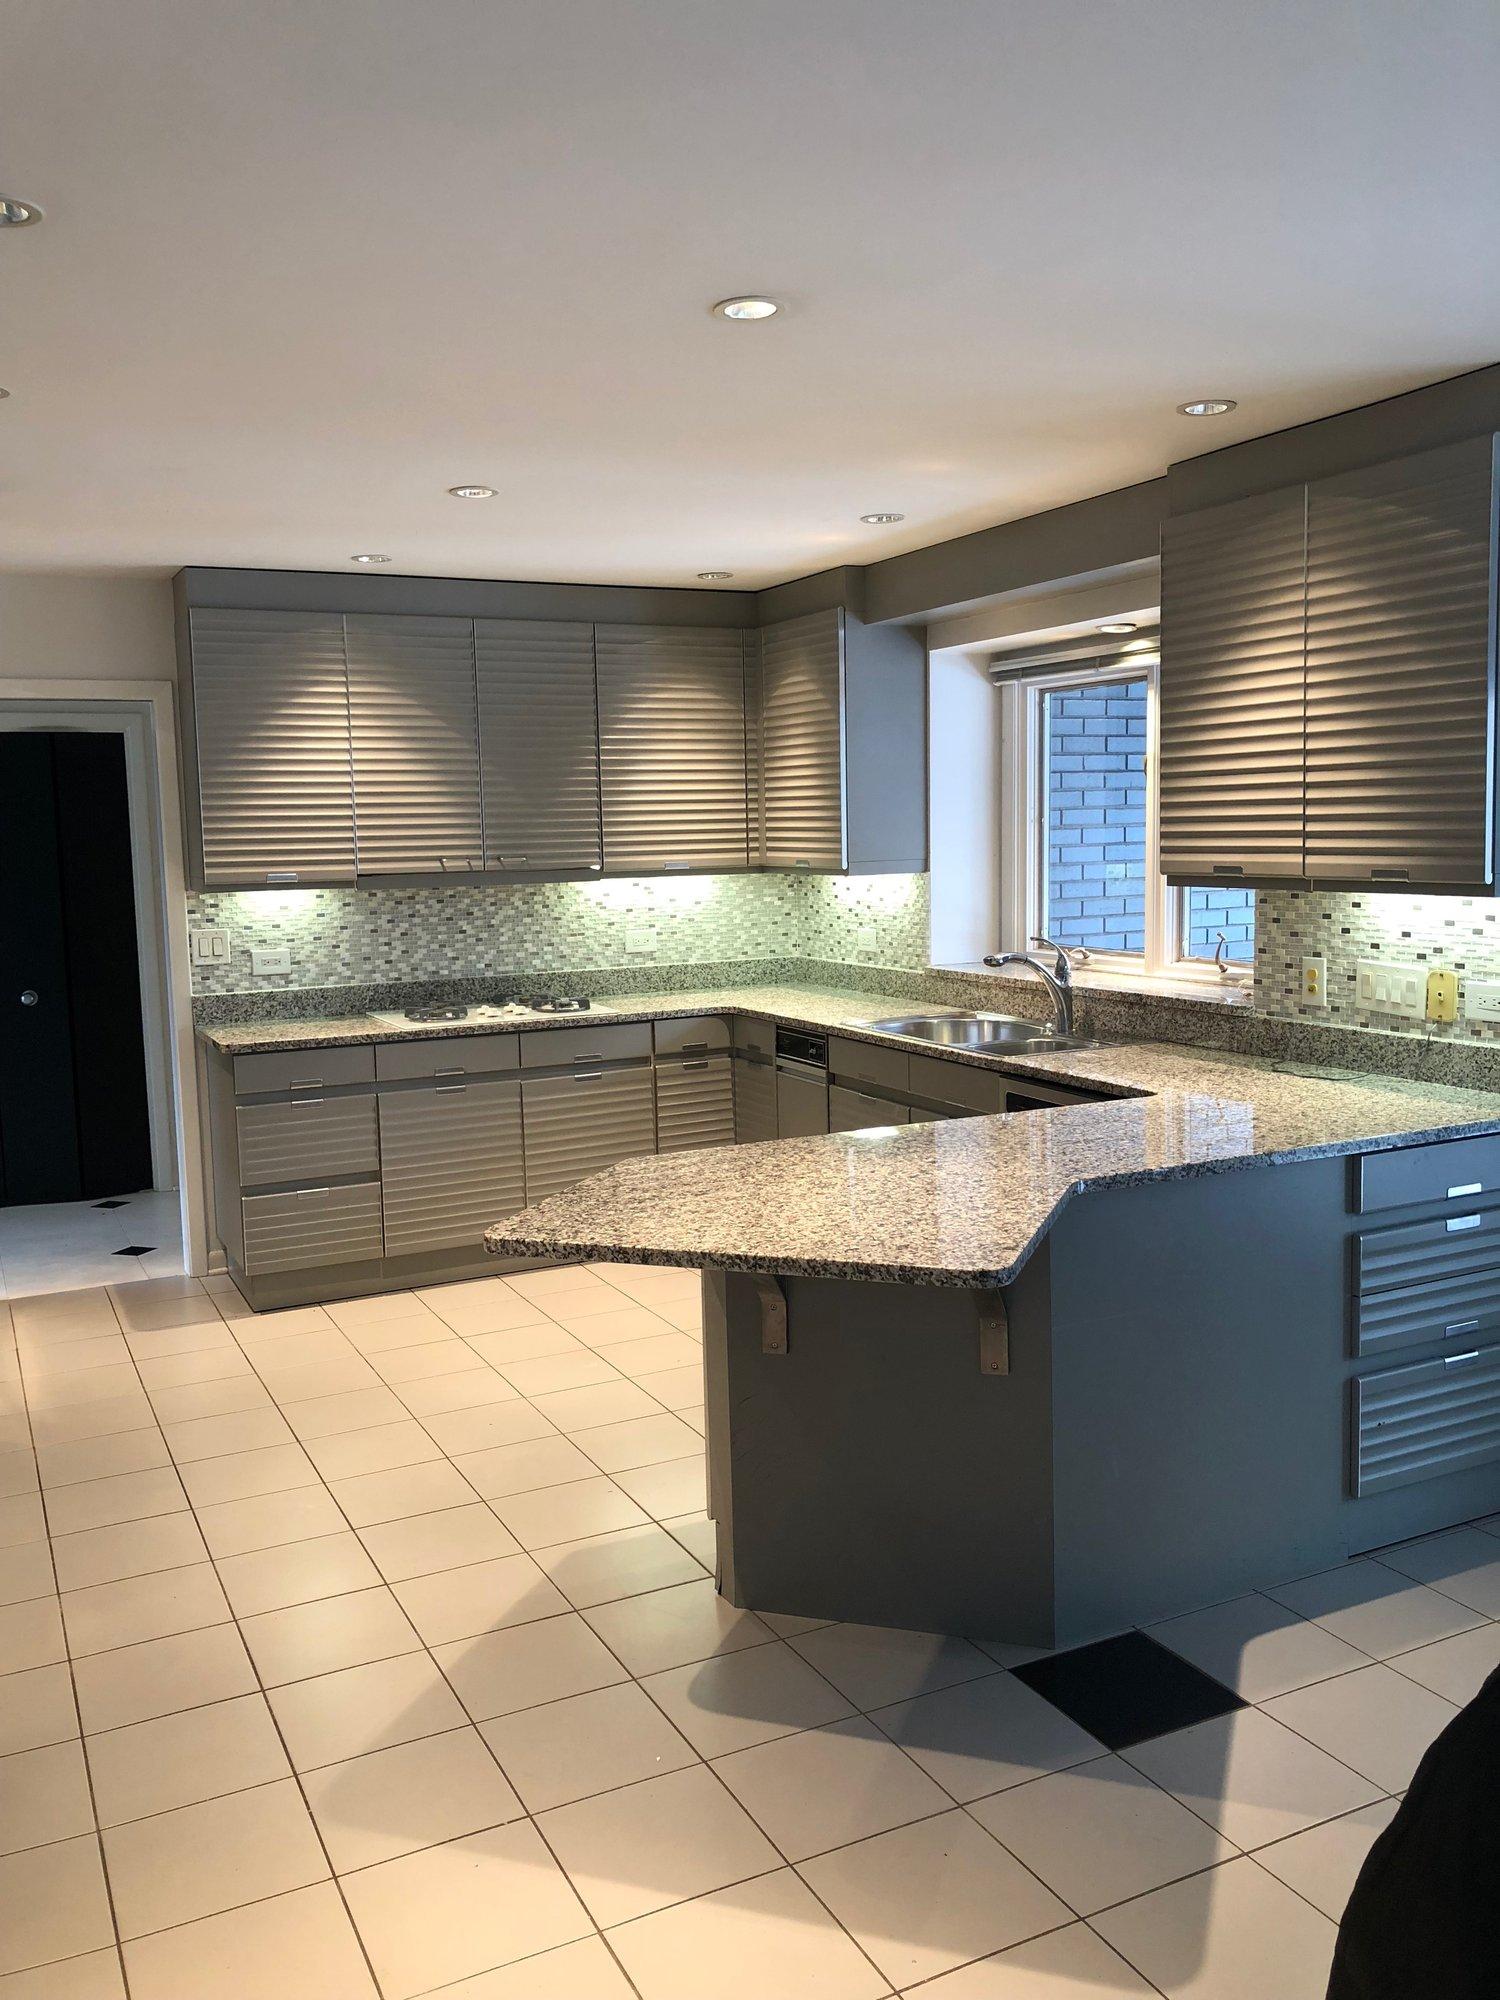 Allmilmo Custom Modern Gray Complete Kitchen Sub Zero Thermador Stainless Appliances Granite Little Green Kitchens